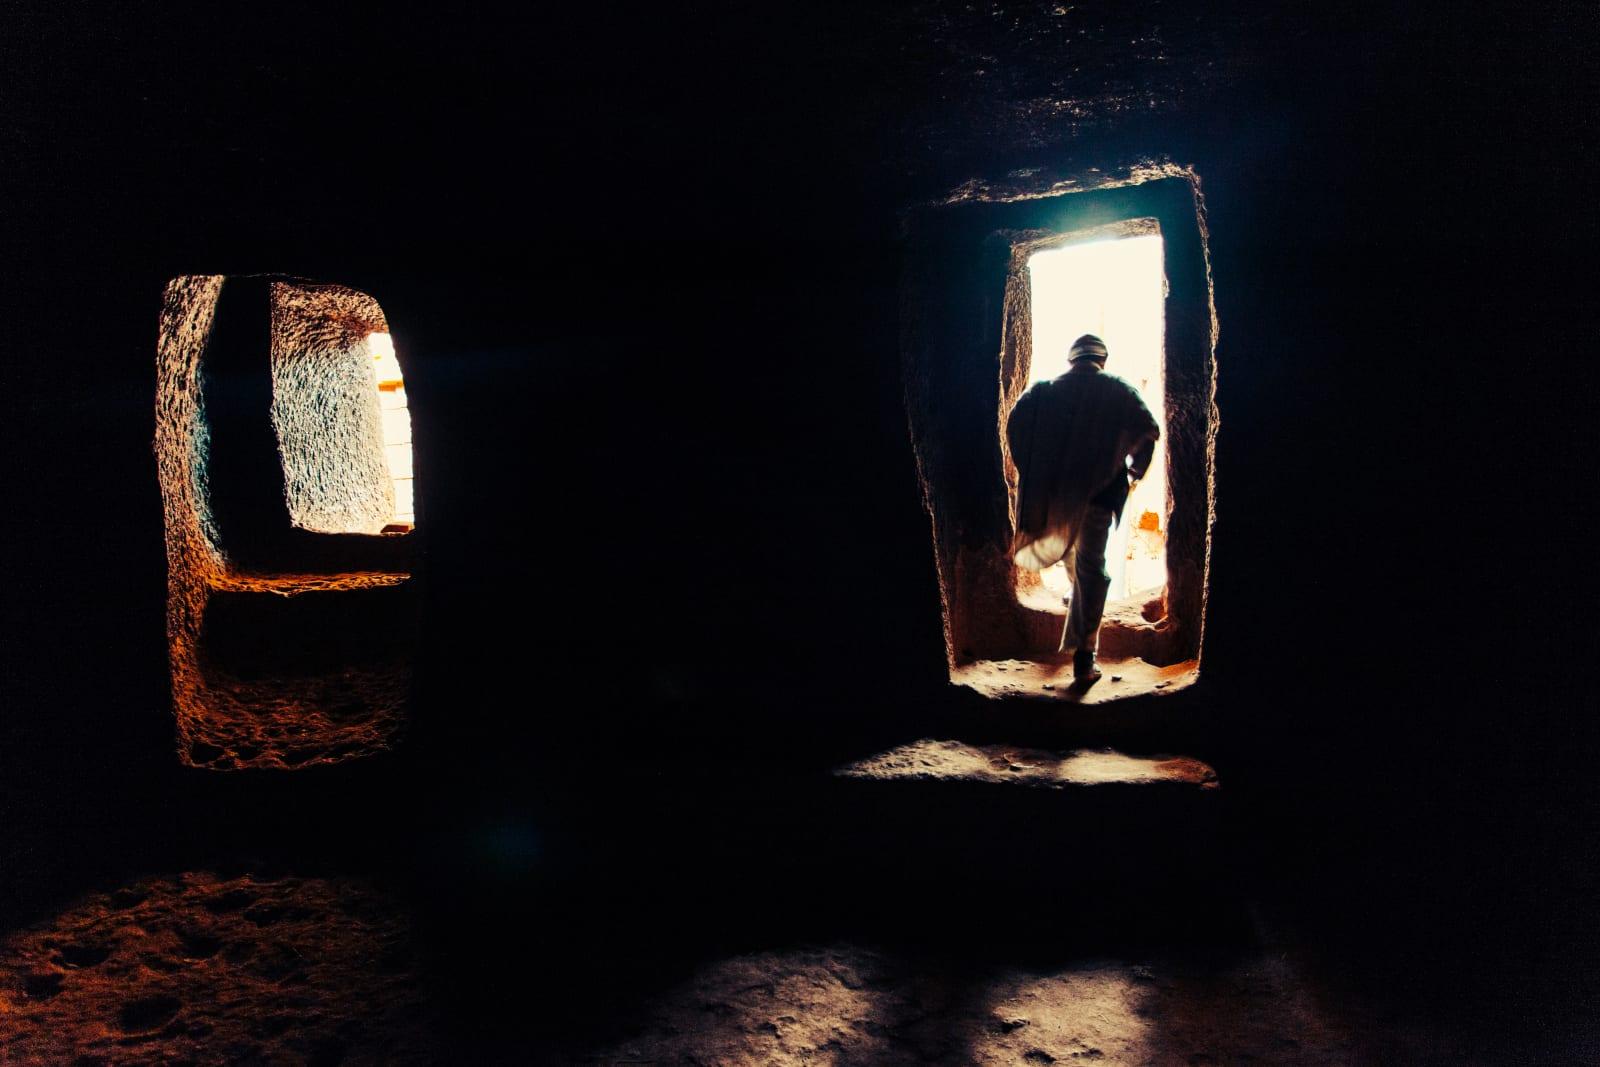 Abiy Solomon, Primordial Modernity: The Raw Spirit of Lalibela VI, 2014